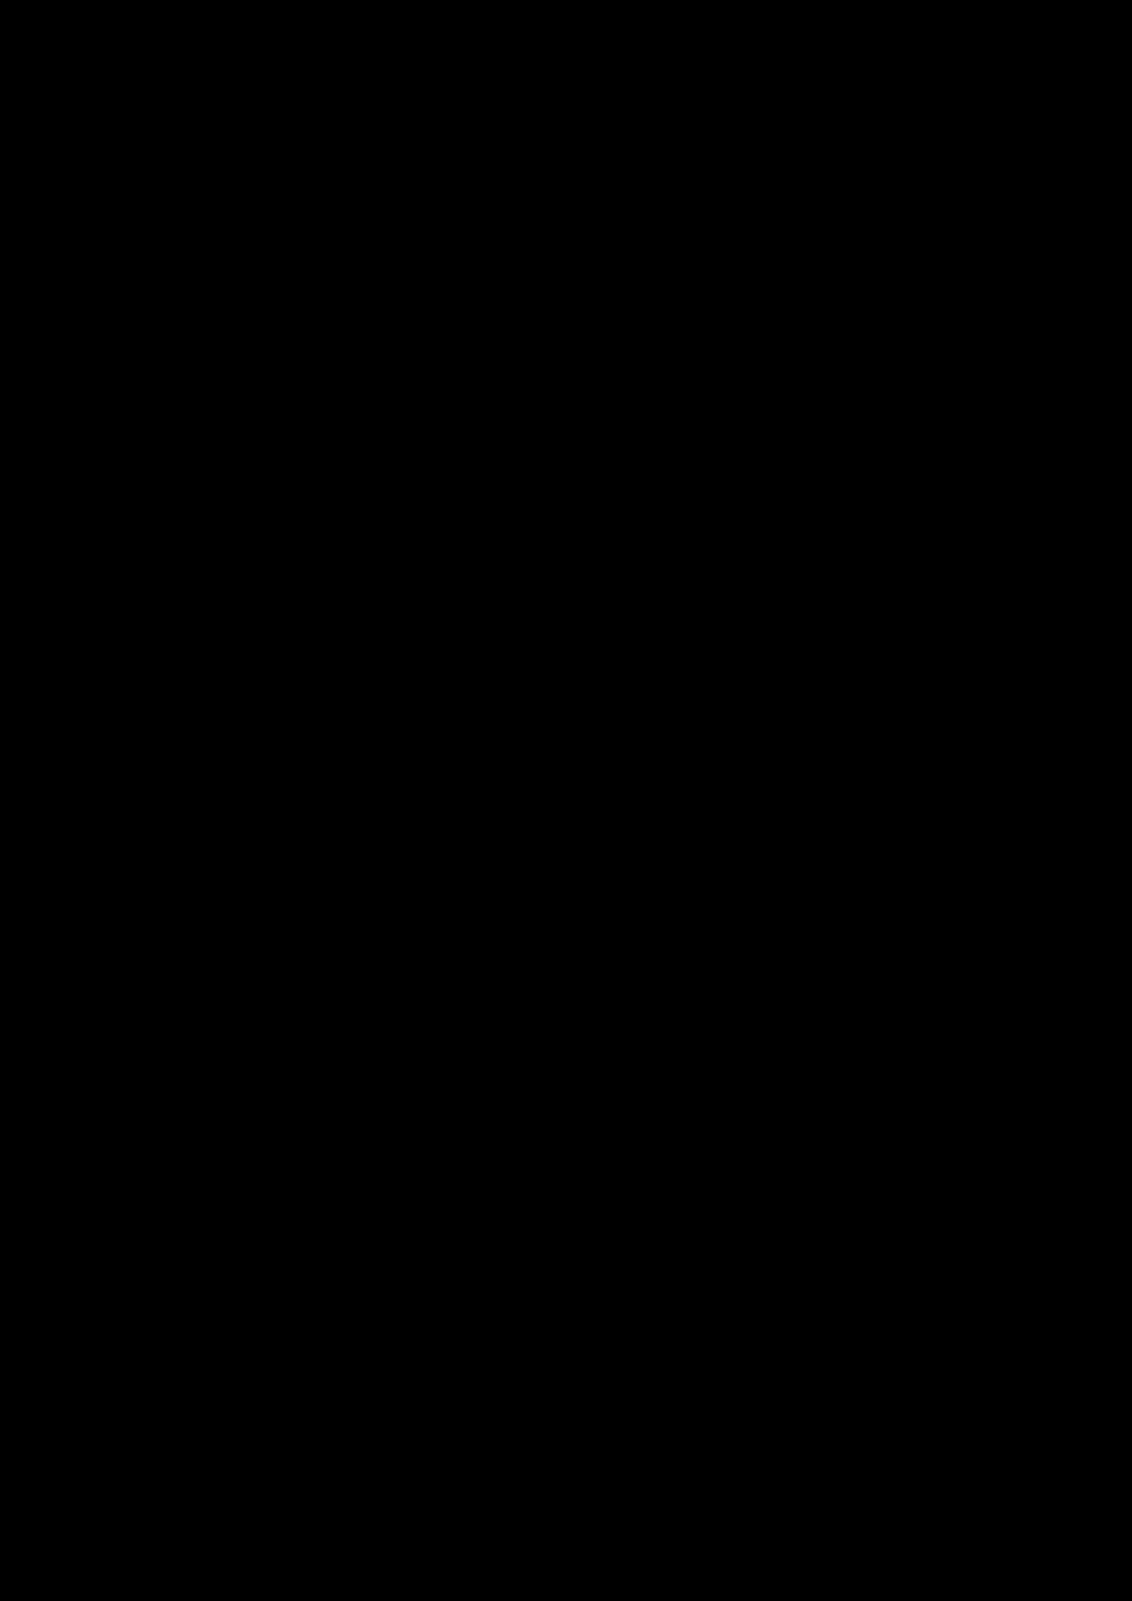 Belyiy sokol slide, Image 53